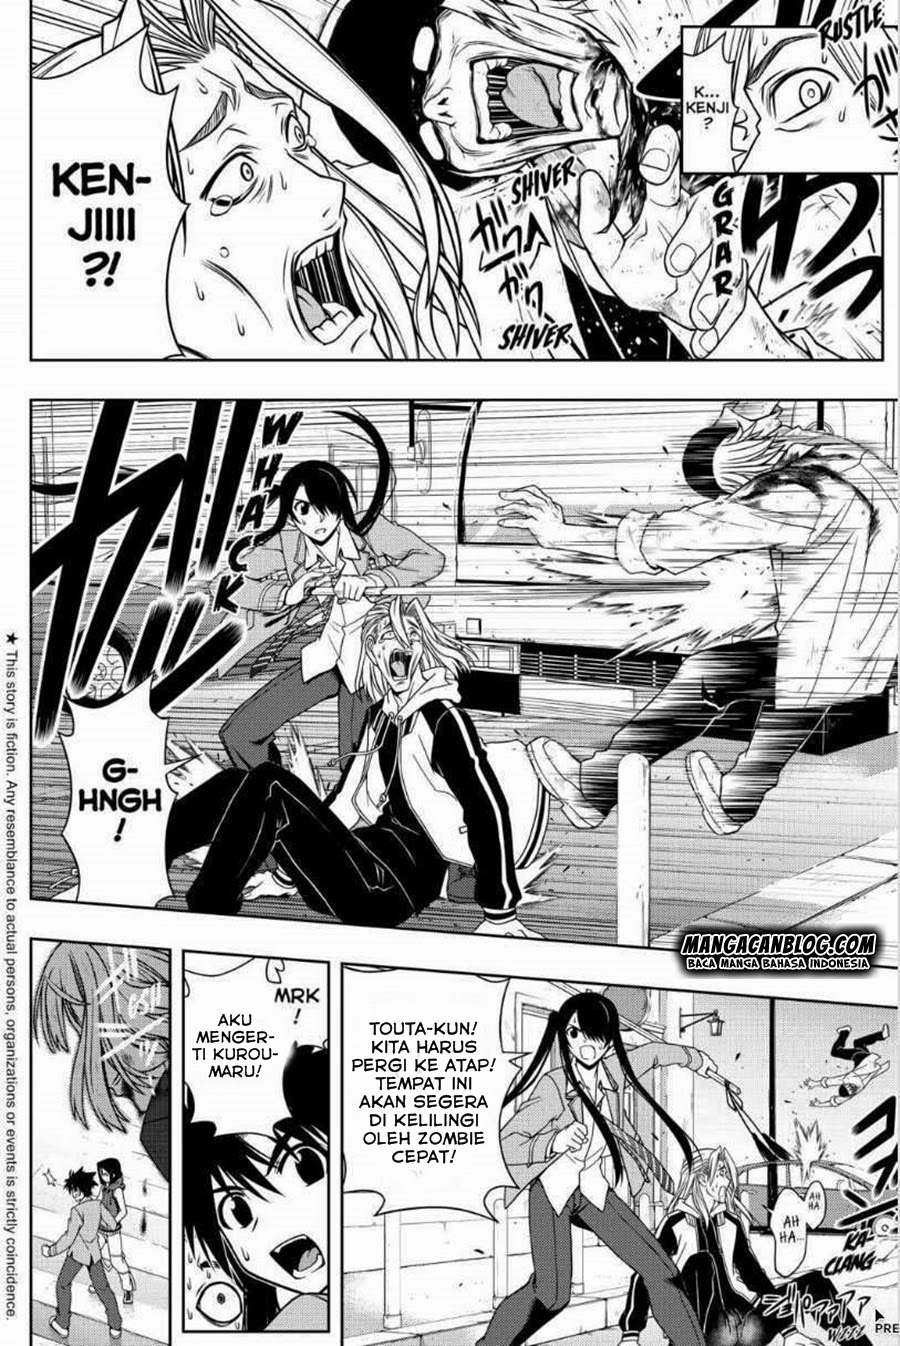 Komik uq holder 053 - buat latihan 54 Indonesia uq holder 053 - buat latihan Terbaru 2|Baca Manga Komik Indonesia